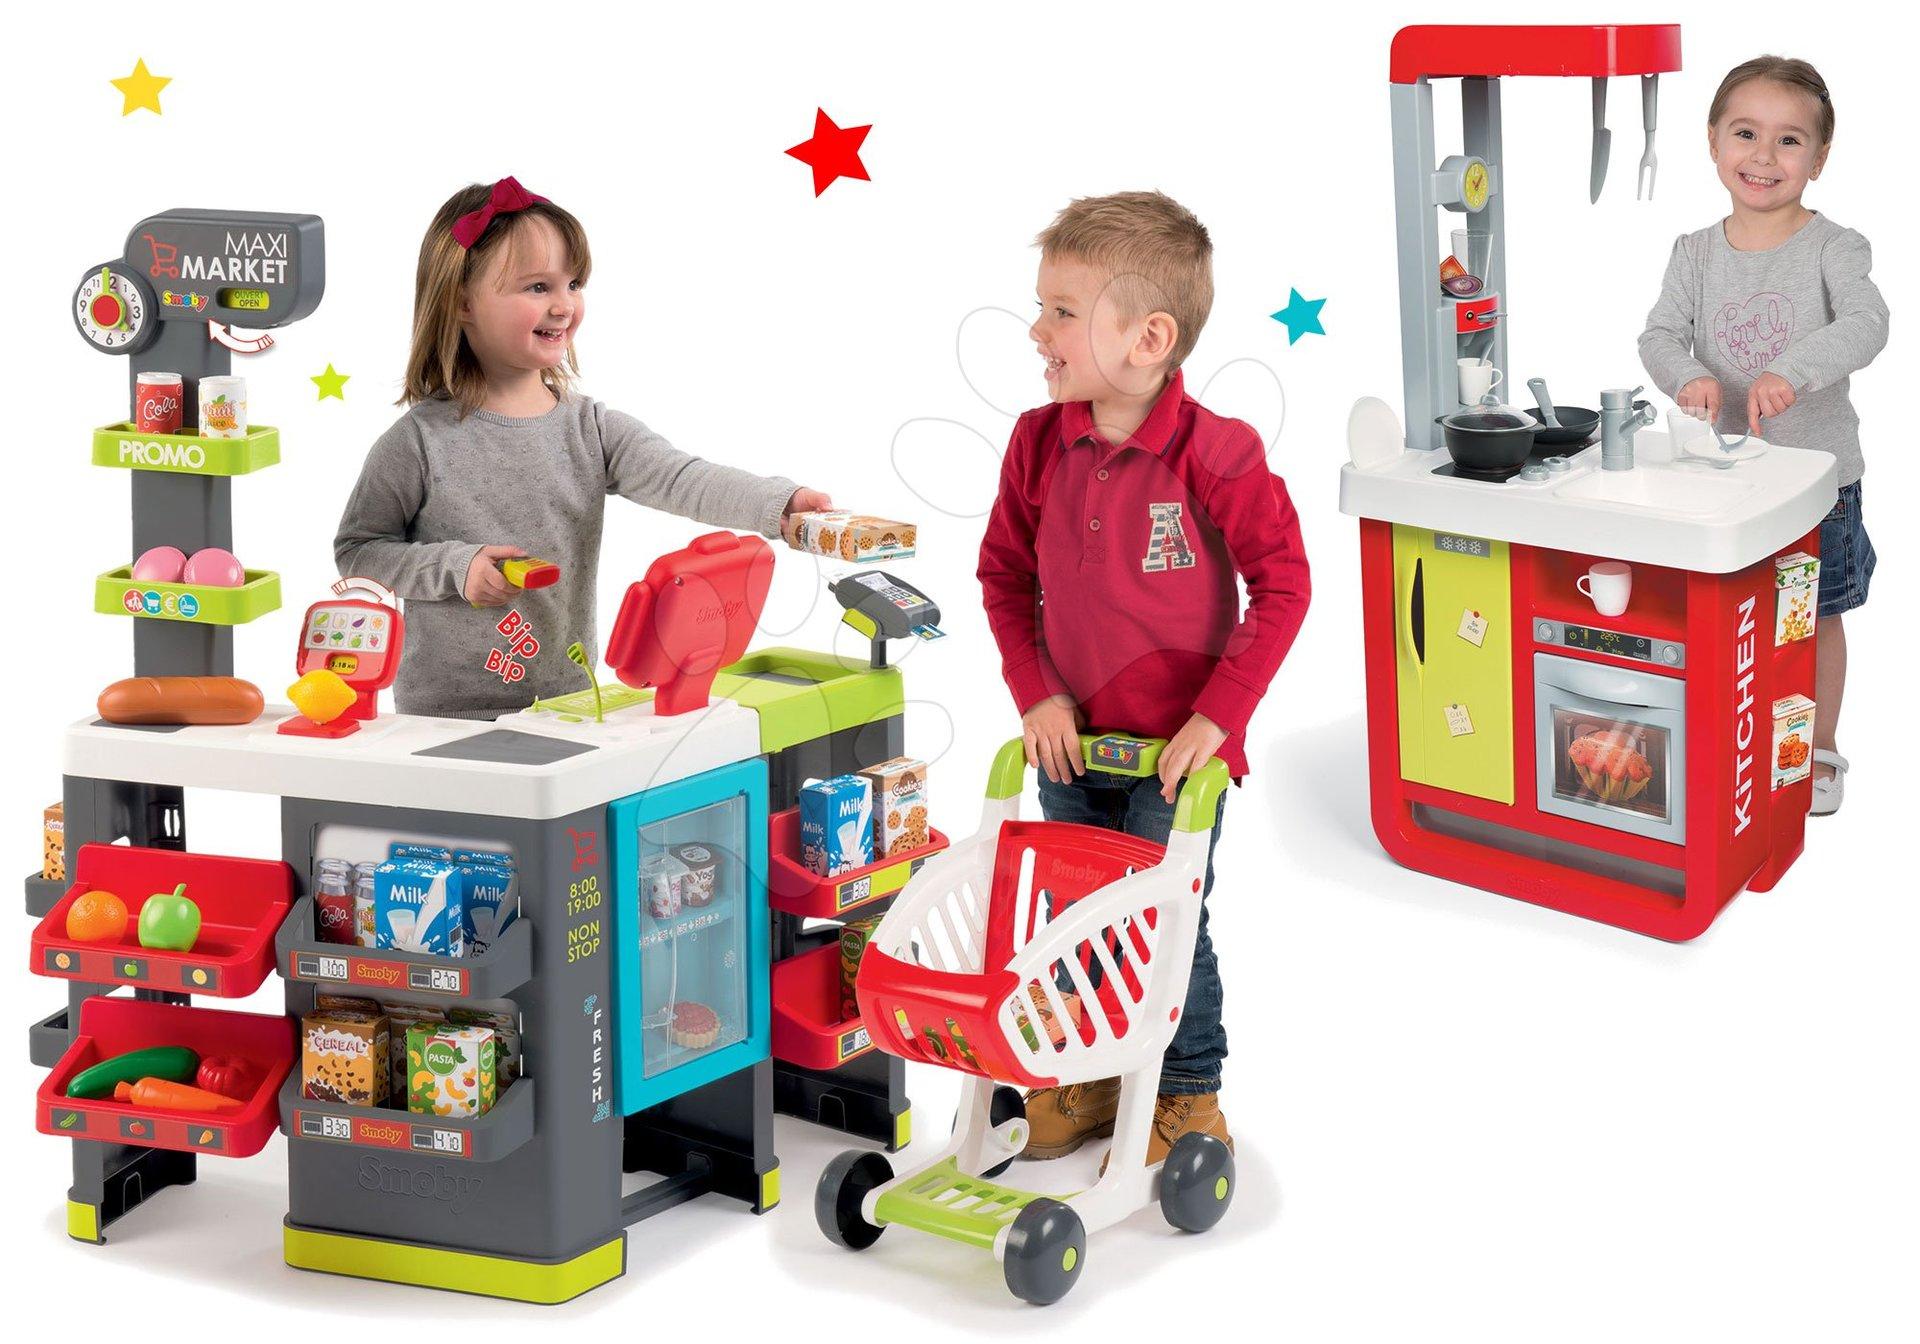 Smoby detský obchod Maxi Market a kuchynka Cherry Special 350215-21